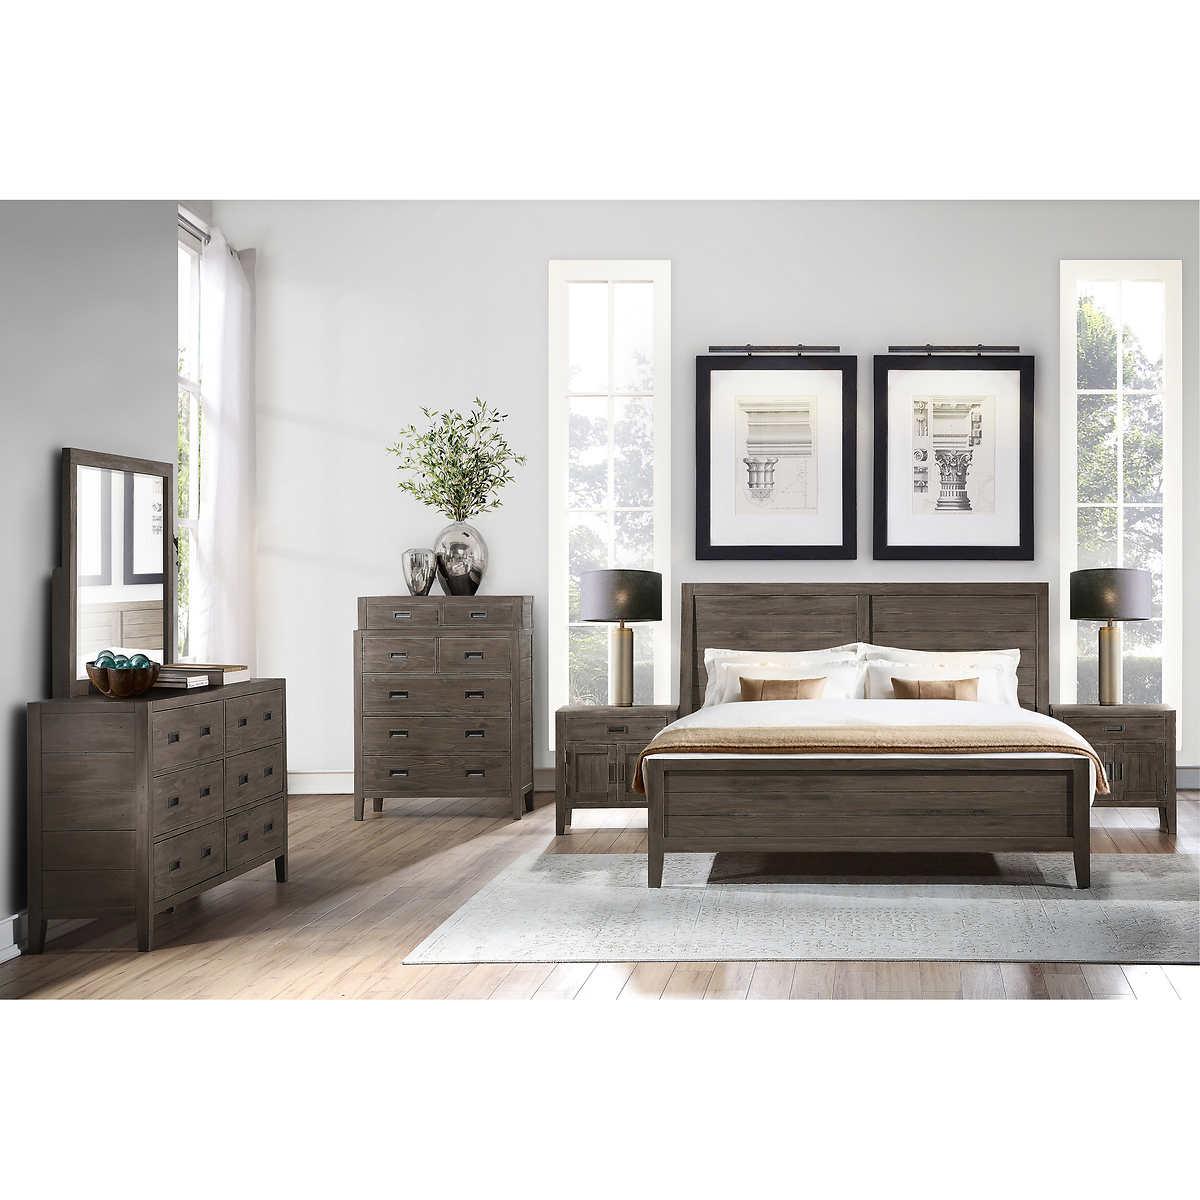 Clarissa 9-piece King Bedroom Set